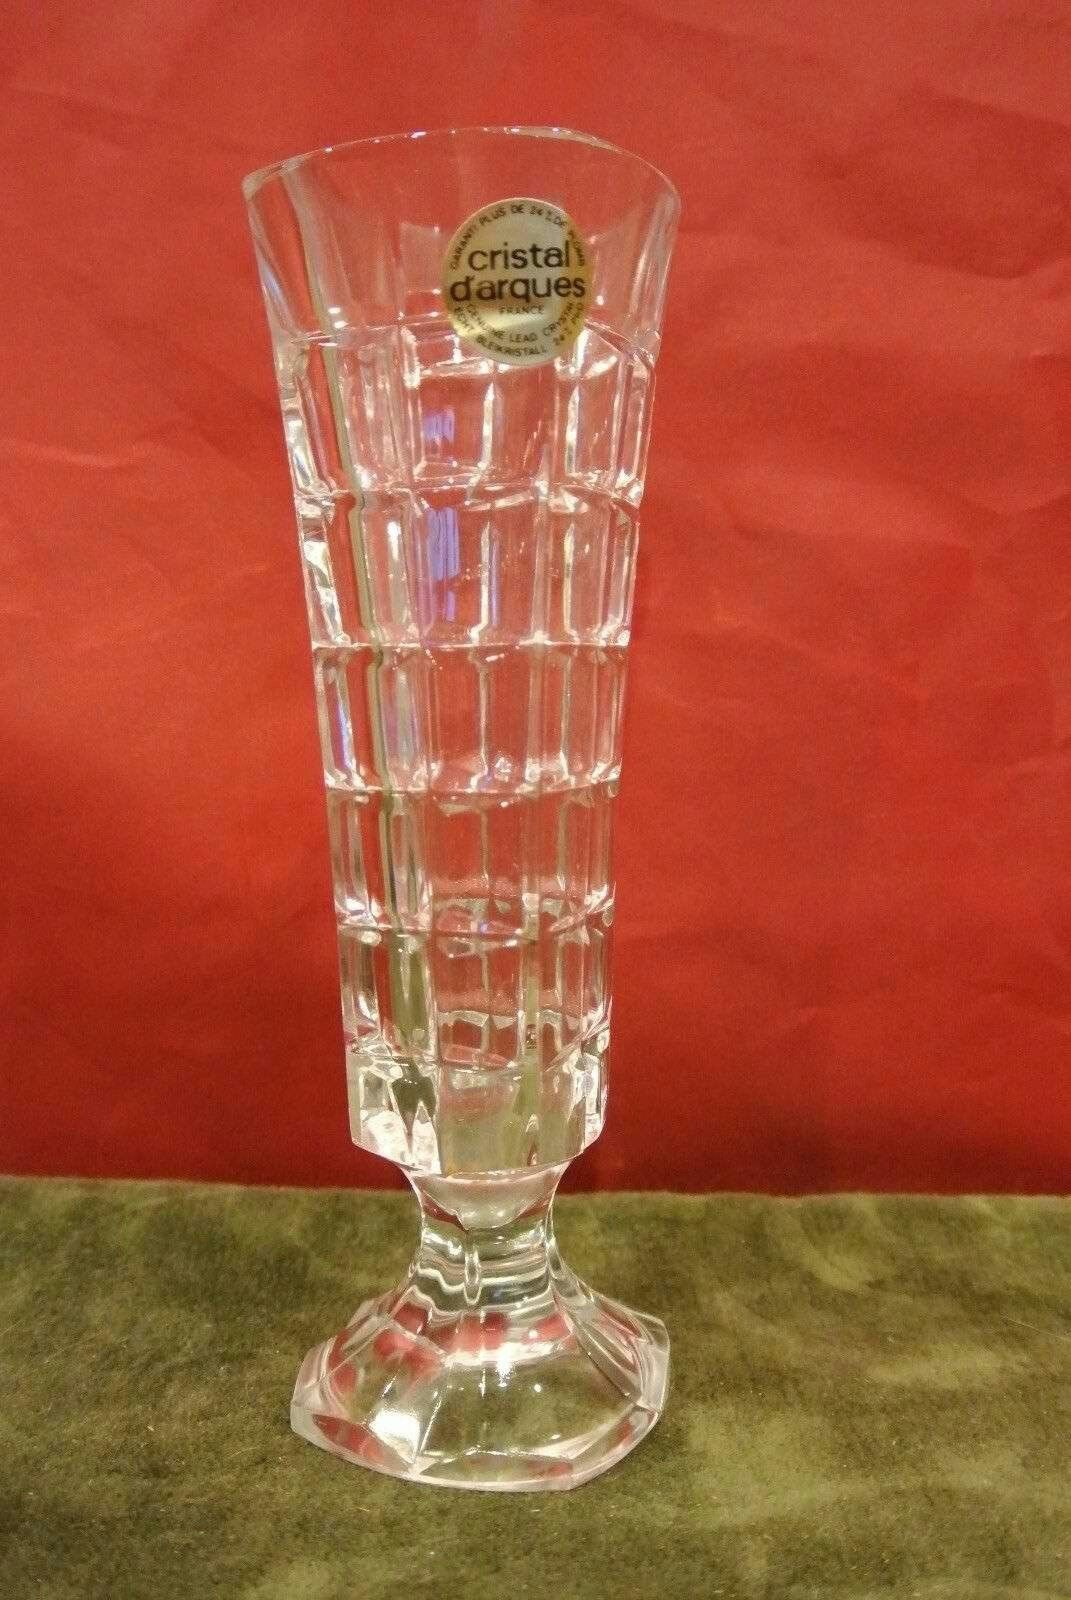 Cristal darques france lead crystal bud vase 24 online prices cristal darques france lead crystal bud vase 24 online prices range from reviewsmspy